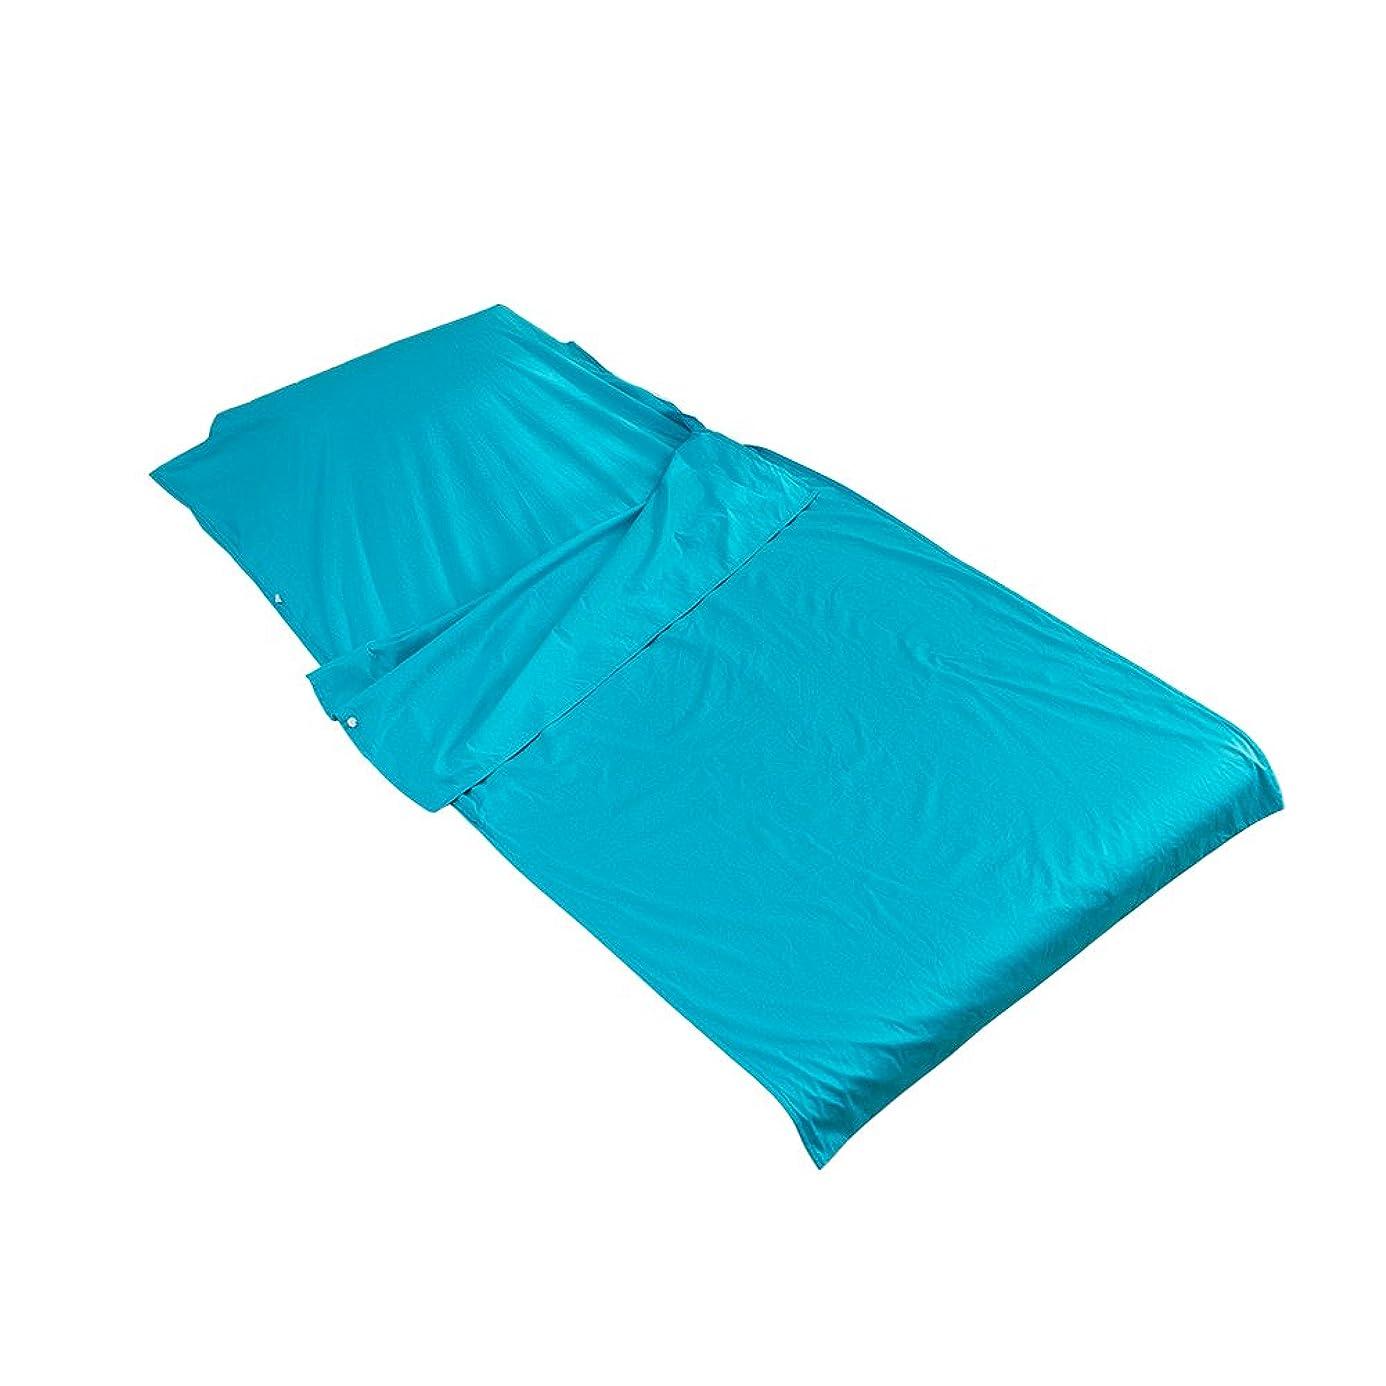 Outry Travel and Camping Sheet, Sleeping Bag Liner/Inner, Lightweight Summer Sleeping Bag